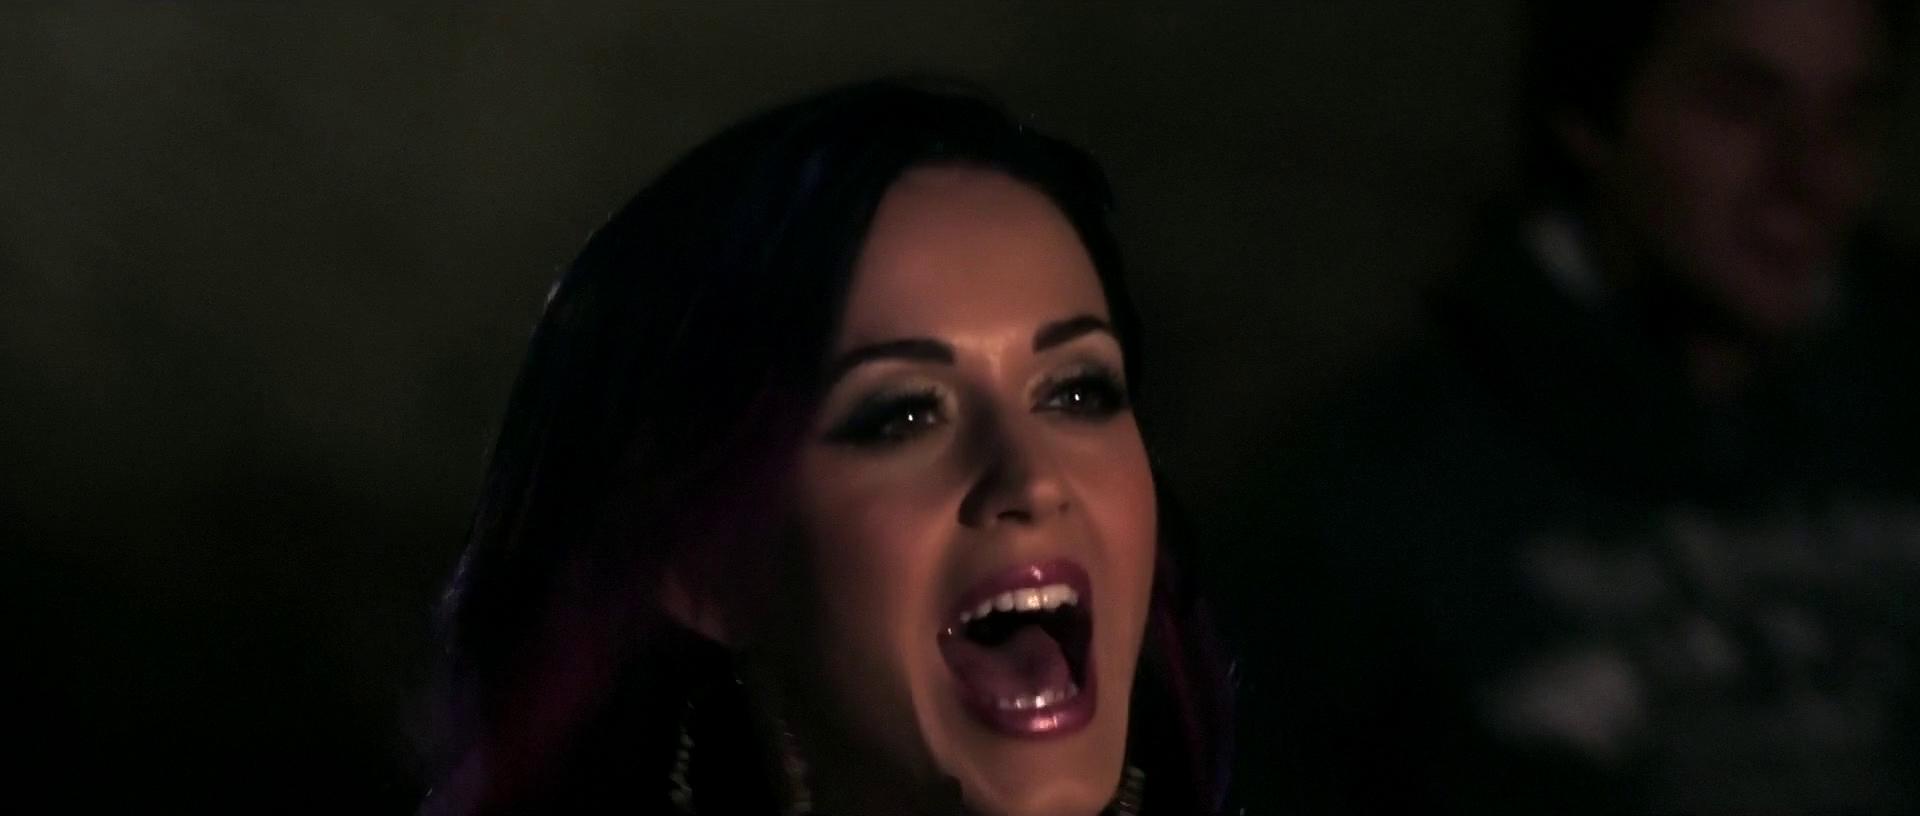 Katy Perry - Firework (2010) HDTVRip 1080p | 60 fps от Kamikkadze